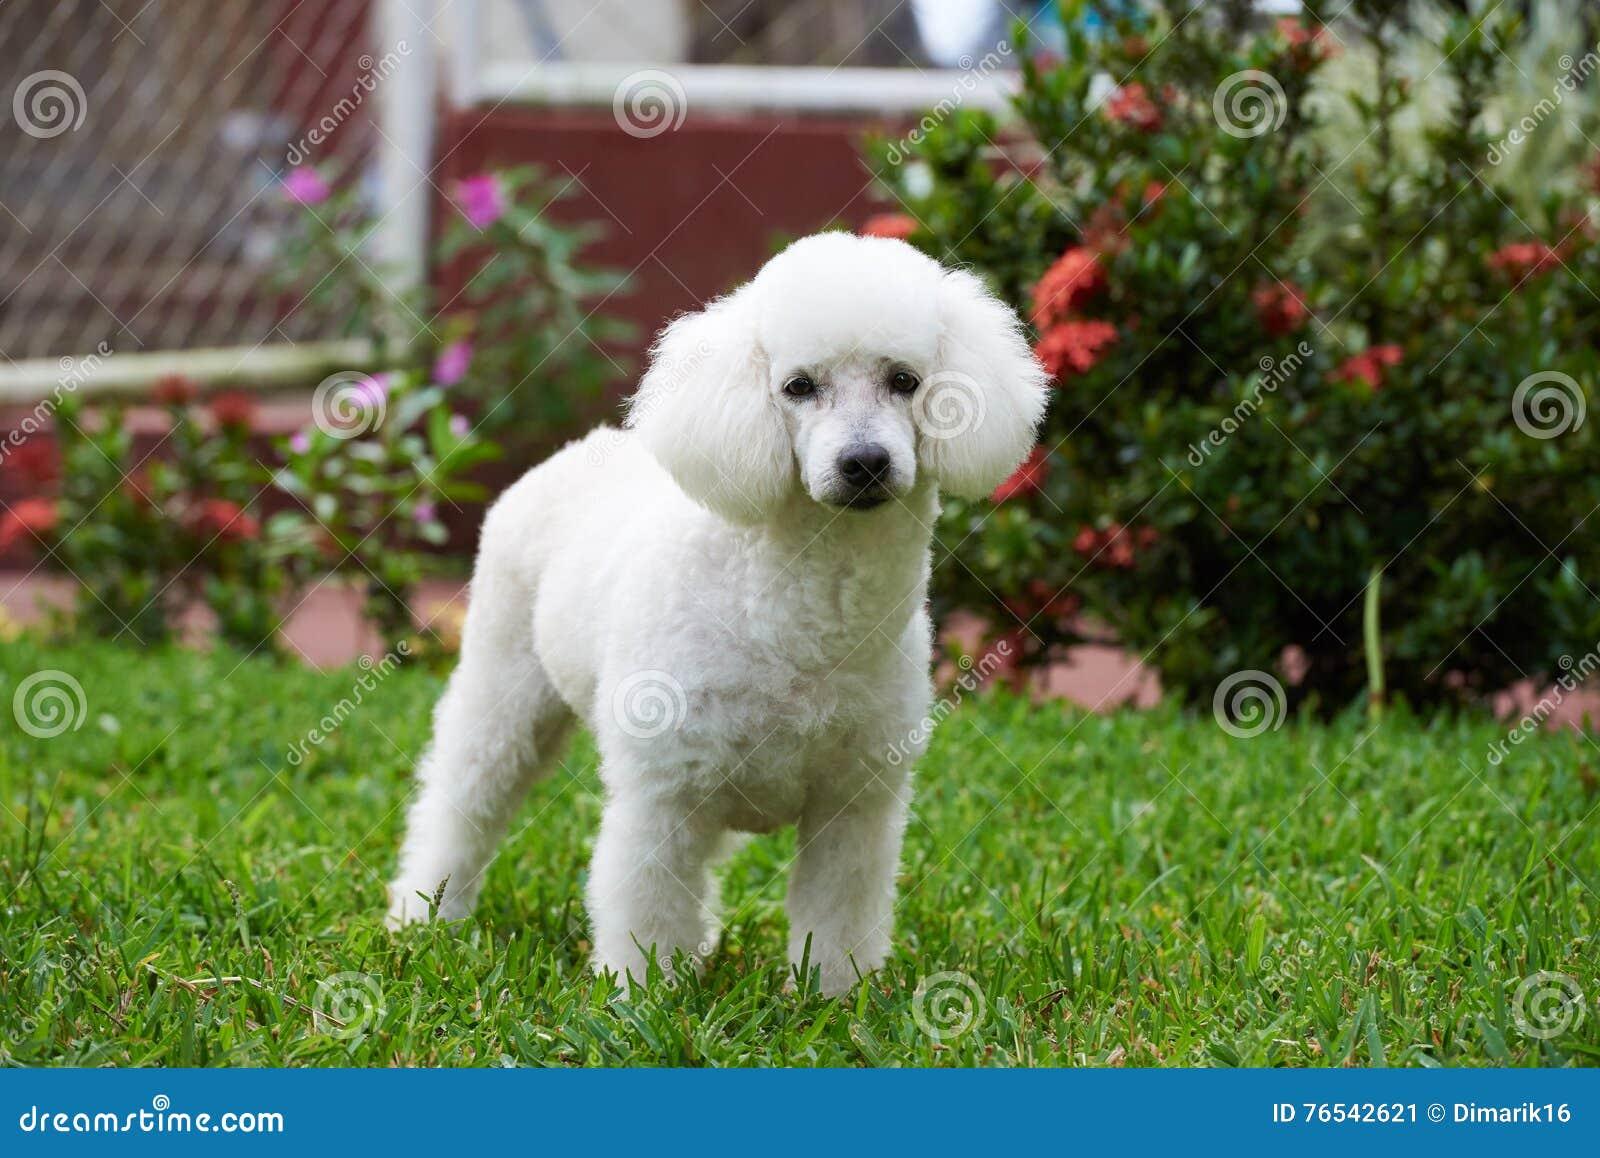 Pretty white french poodle